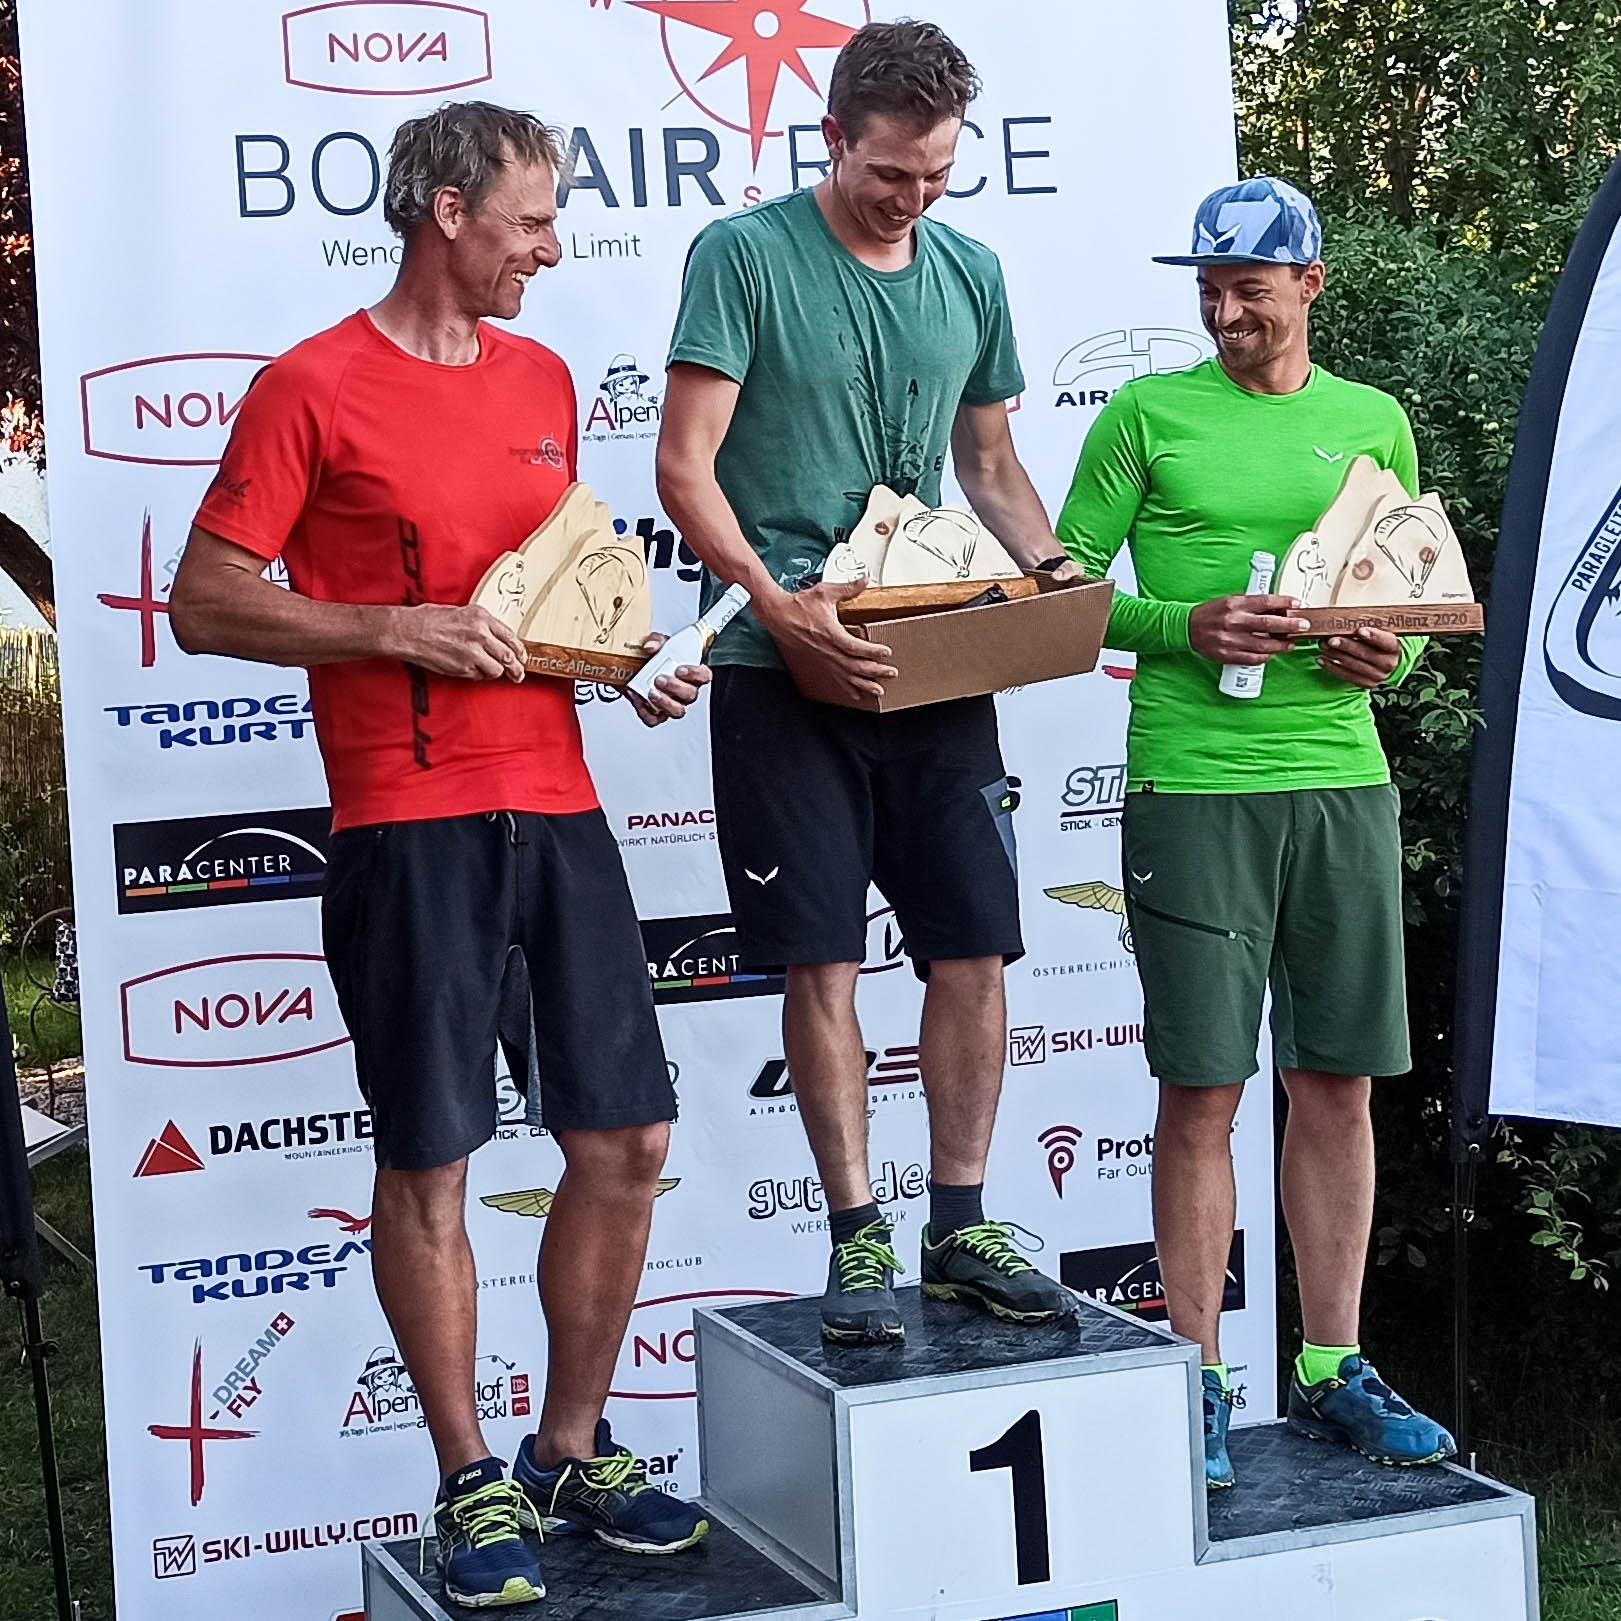 simon2 - Bordairrace Aflenz/Hochschwab – Success!